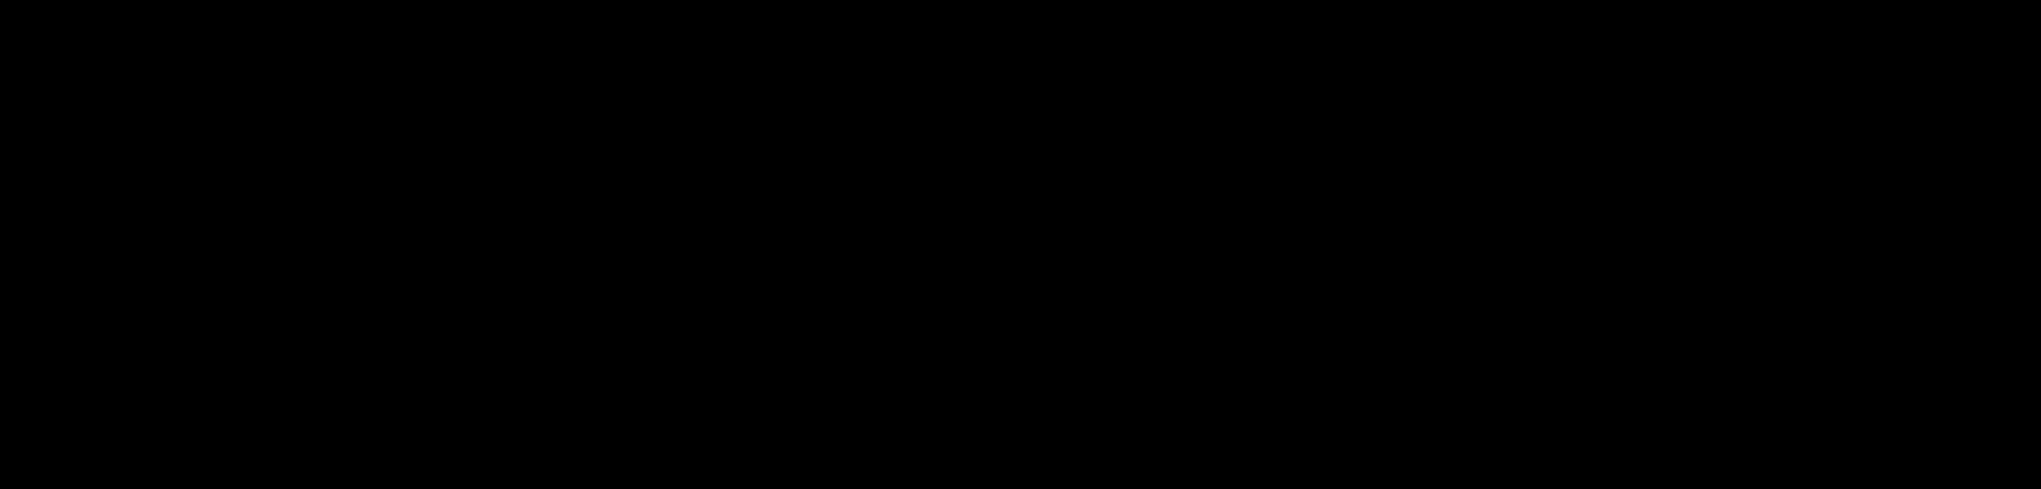 Cindy Cournoyer logo